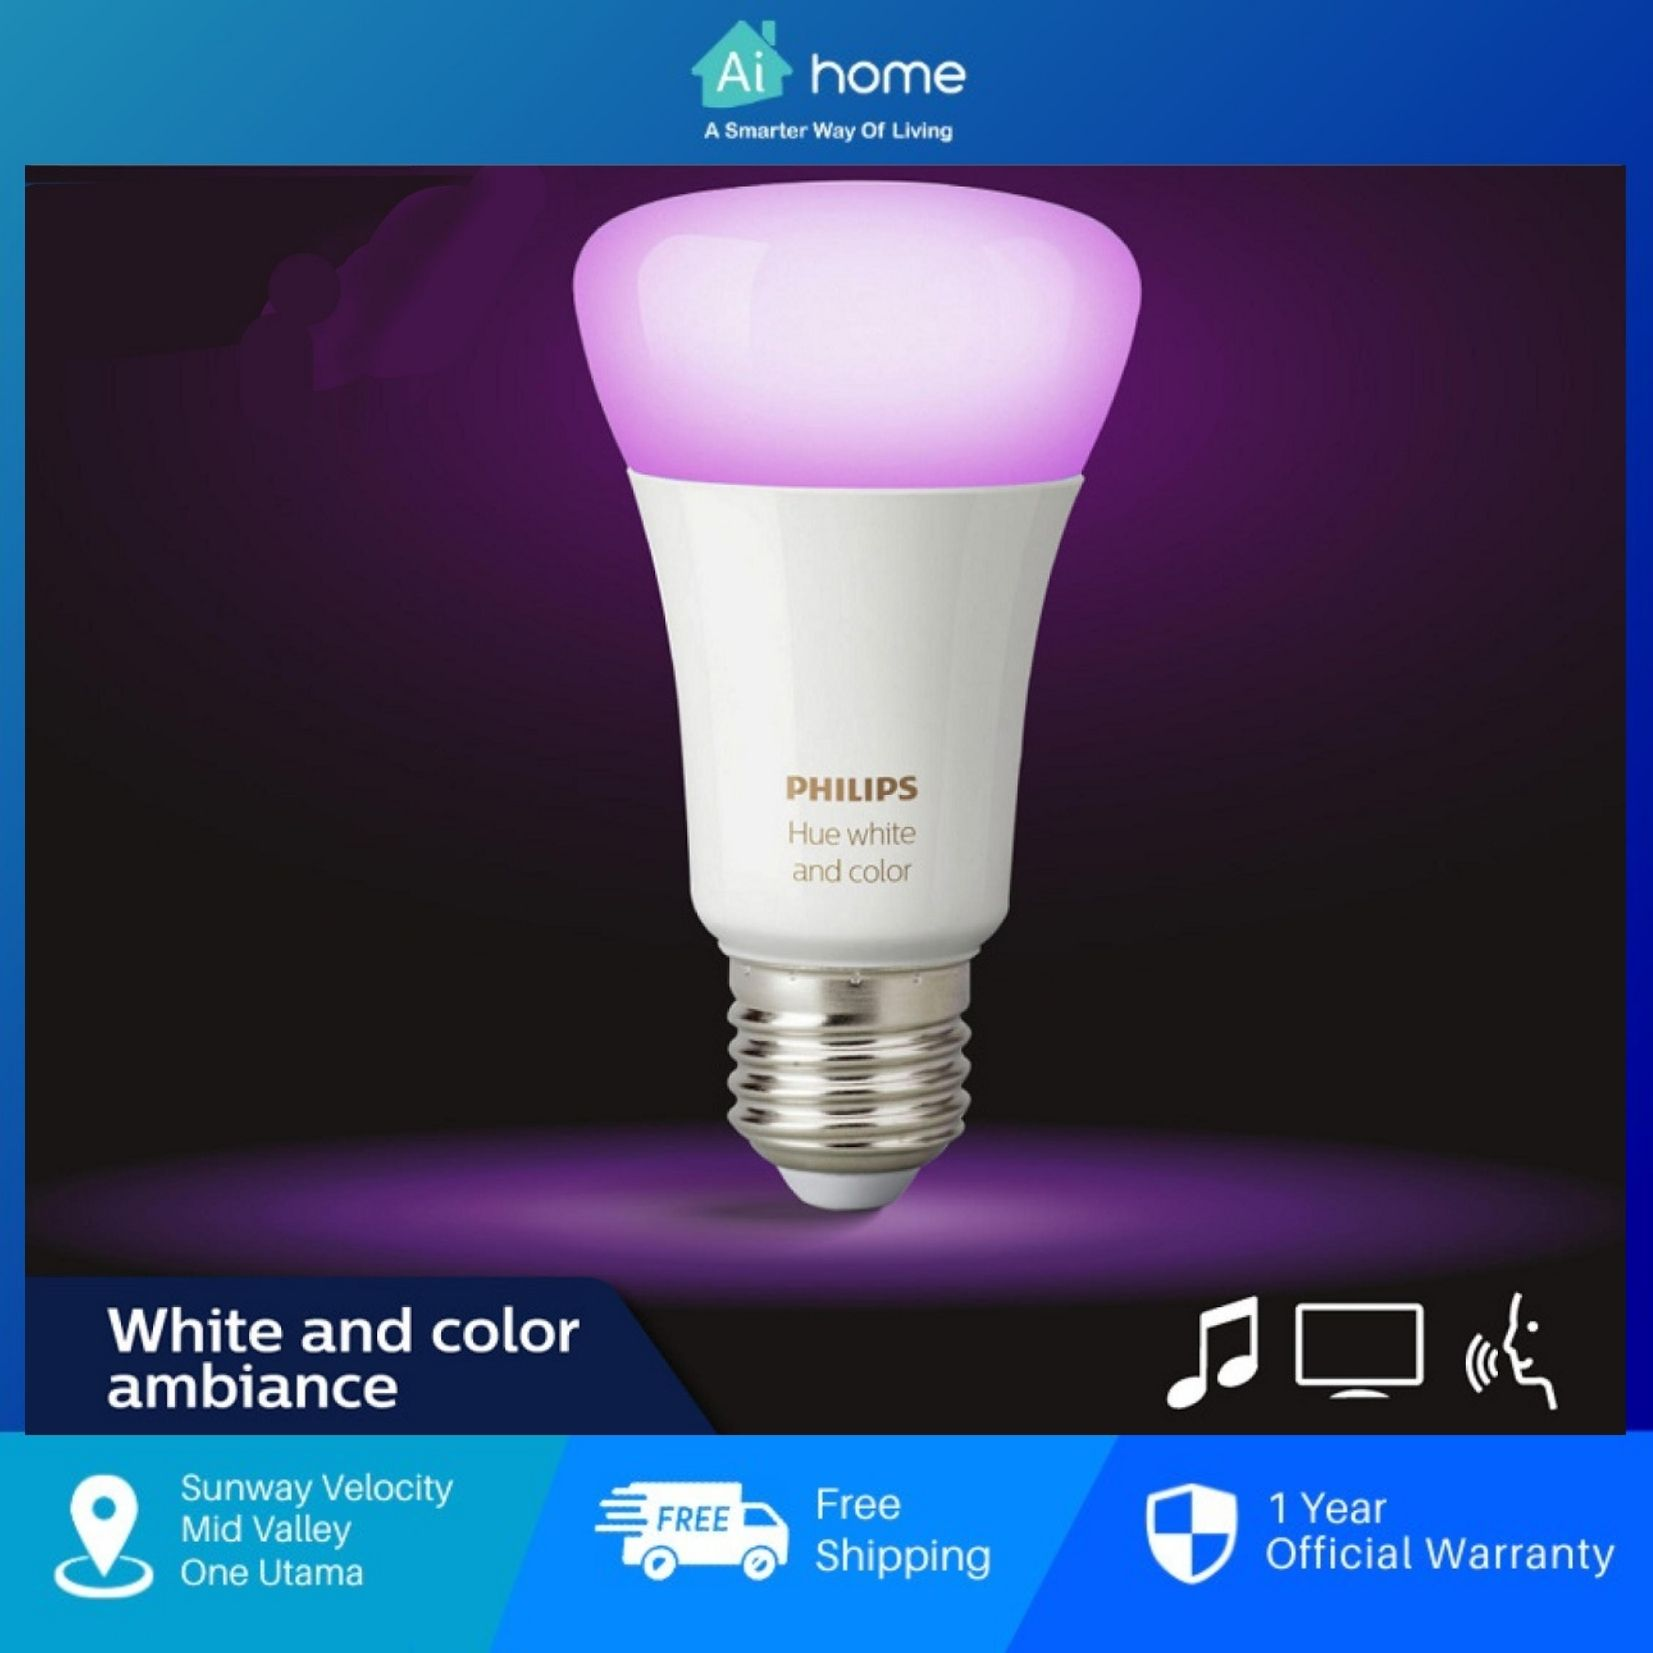 PHILIPS HUE Light Bulb E27 16 millions Color with 2 Year Malaysia Warranty [ Ai Home ]